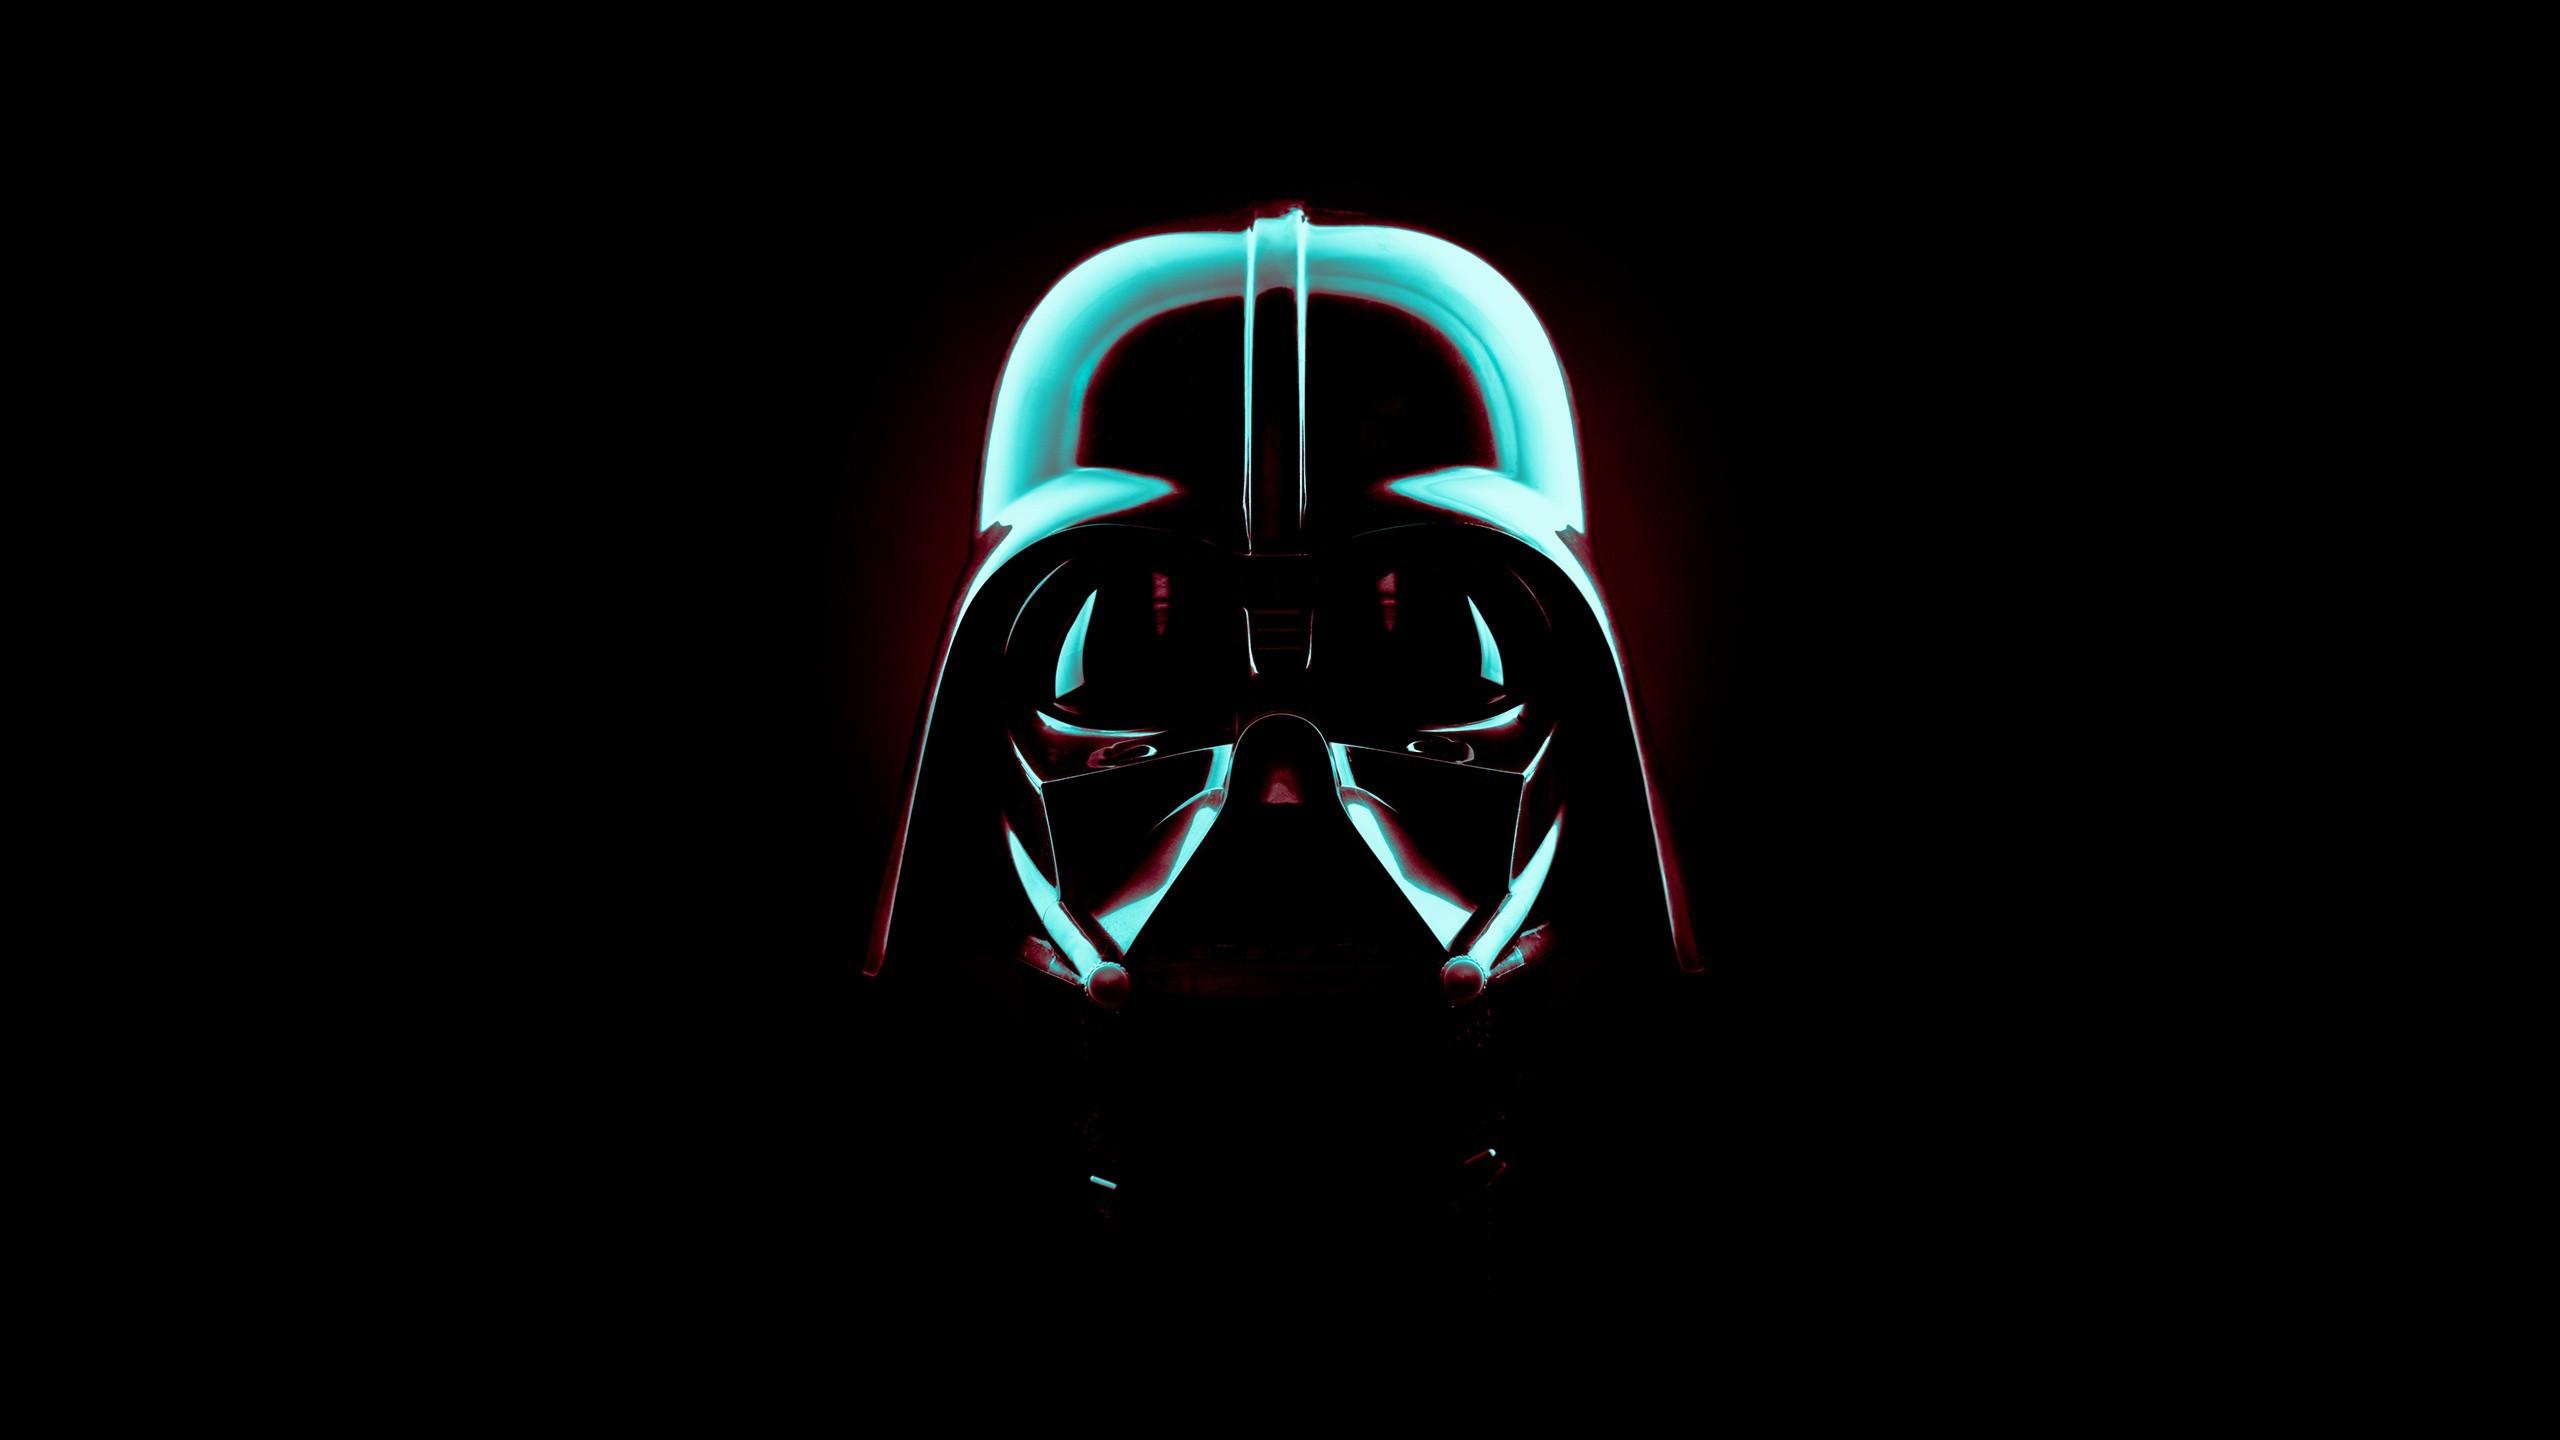 Darth Vader Wallpaper Iphone: Darth Maul IPhone Wallpaper (66+ Images